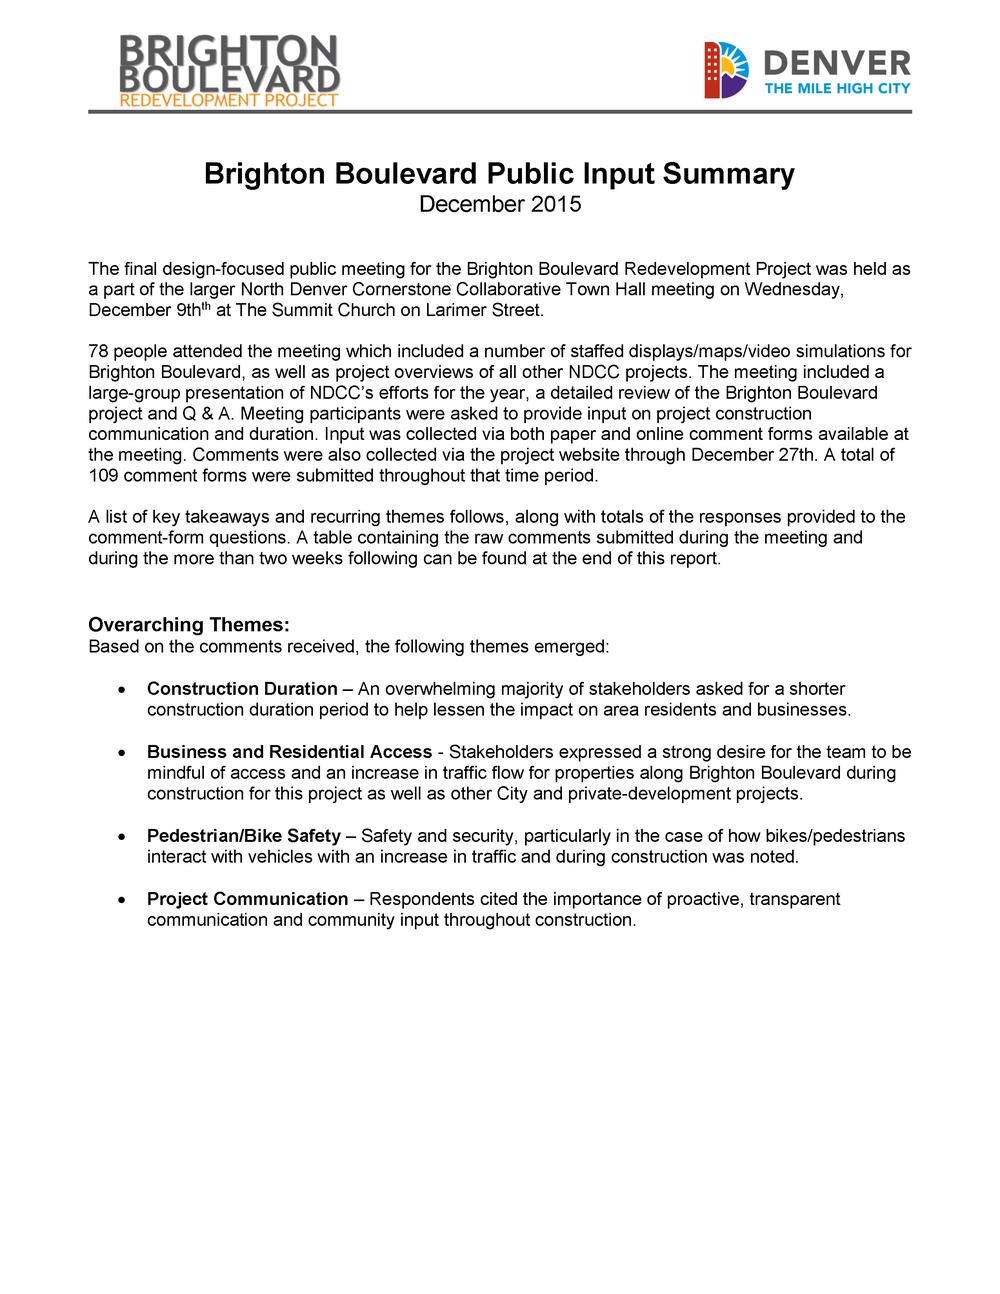 Dec '15 Public Input Summary